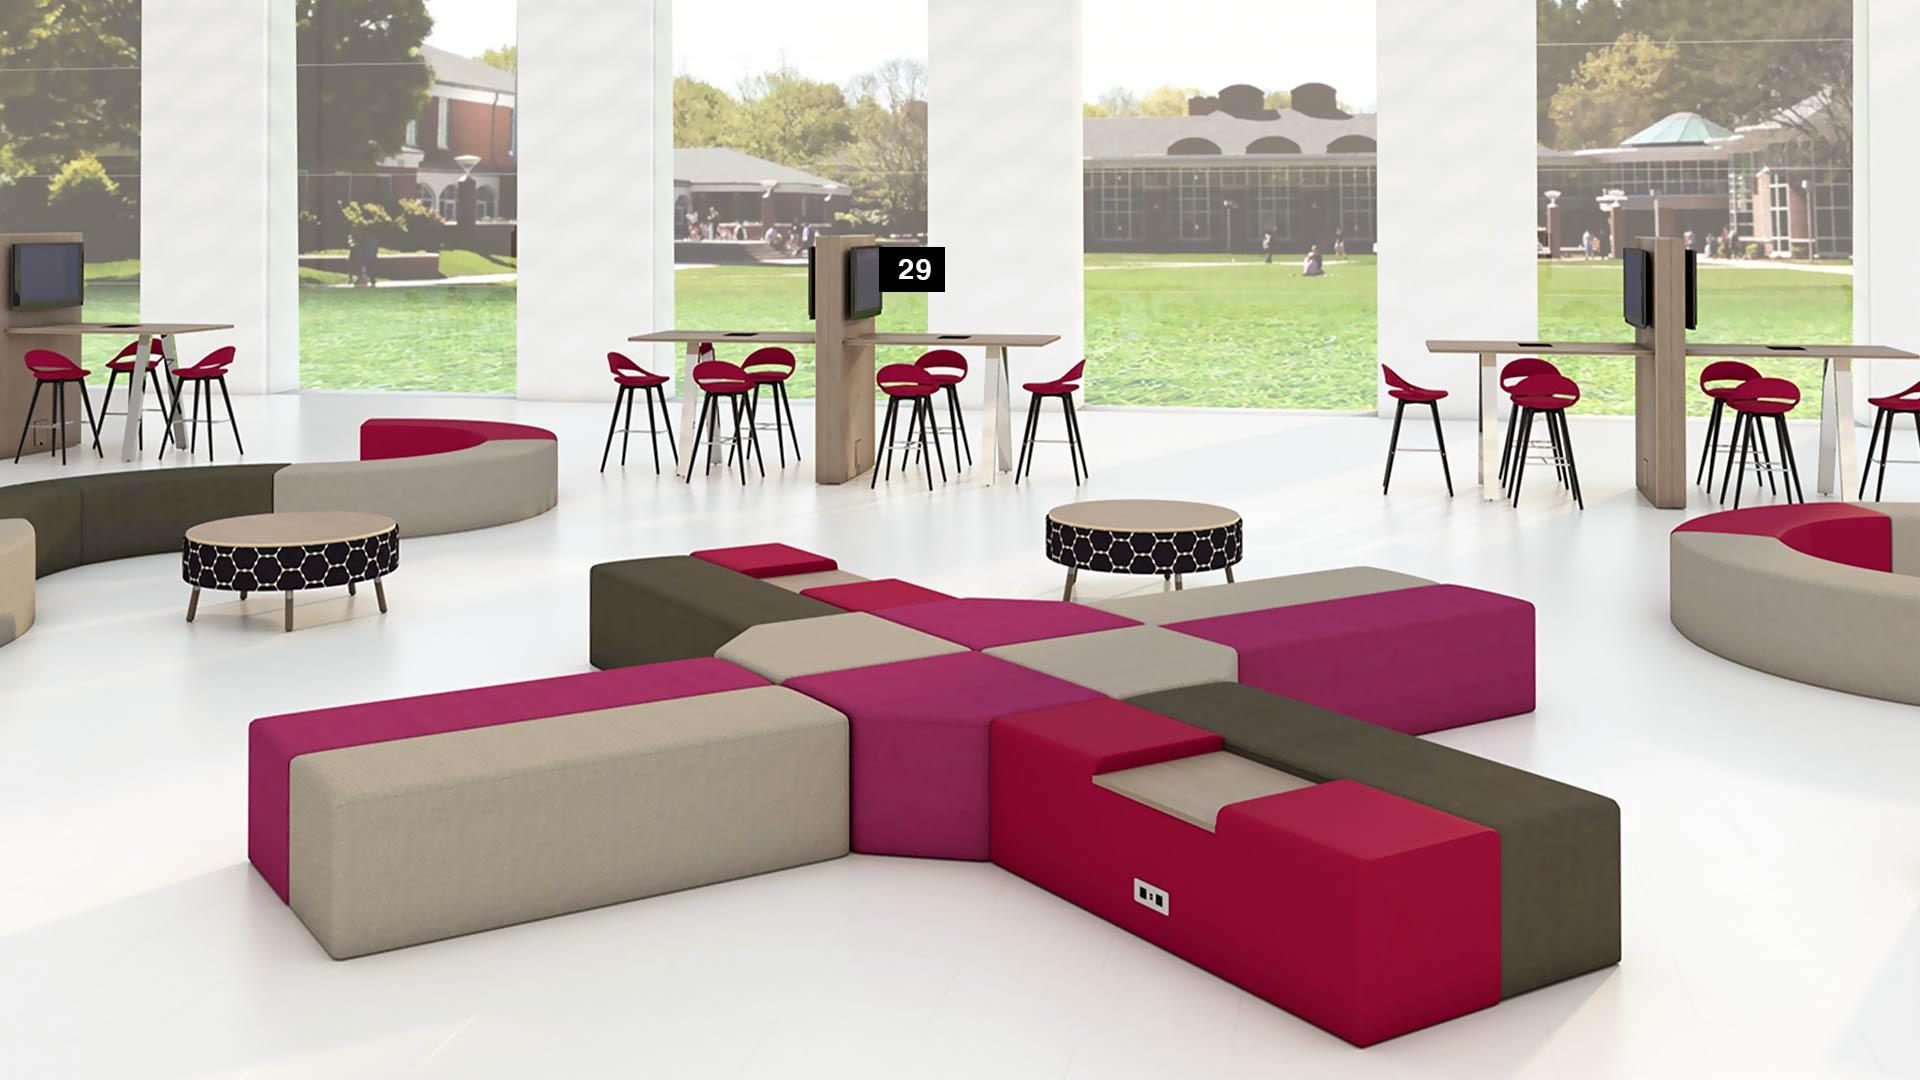 abstract-modern-furniture-erg-international-connos-laguna-aspen-samba